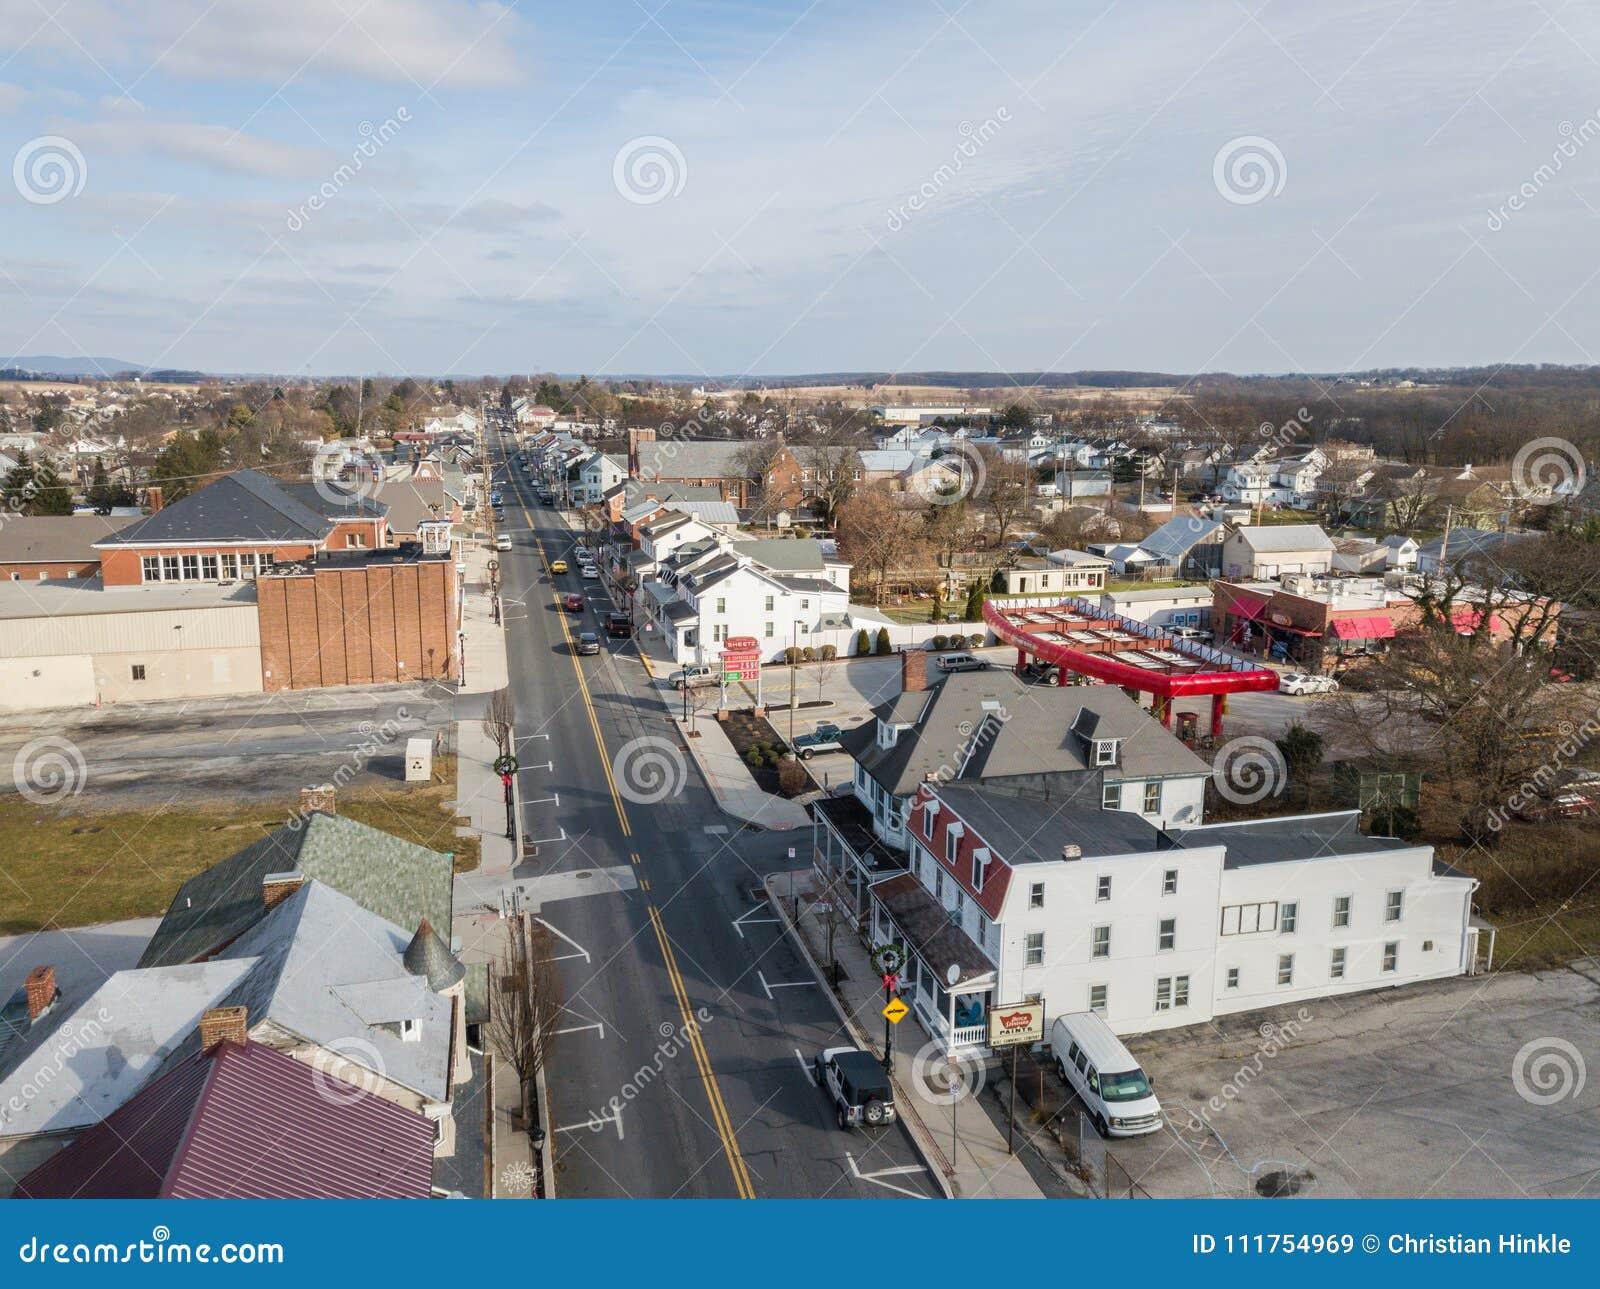 Aerials of Historic Littlestown, Pennsylvania neighboring Gettysburg